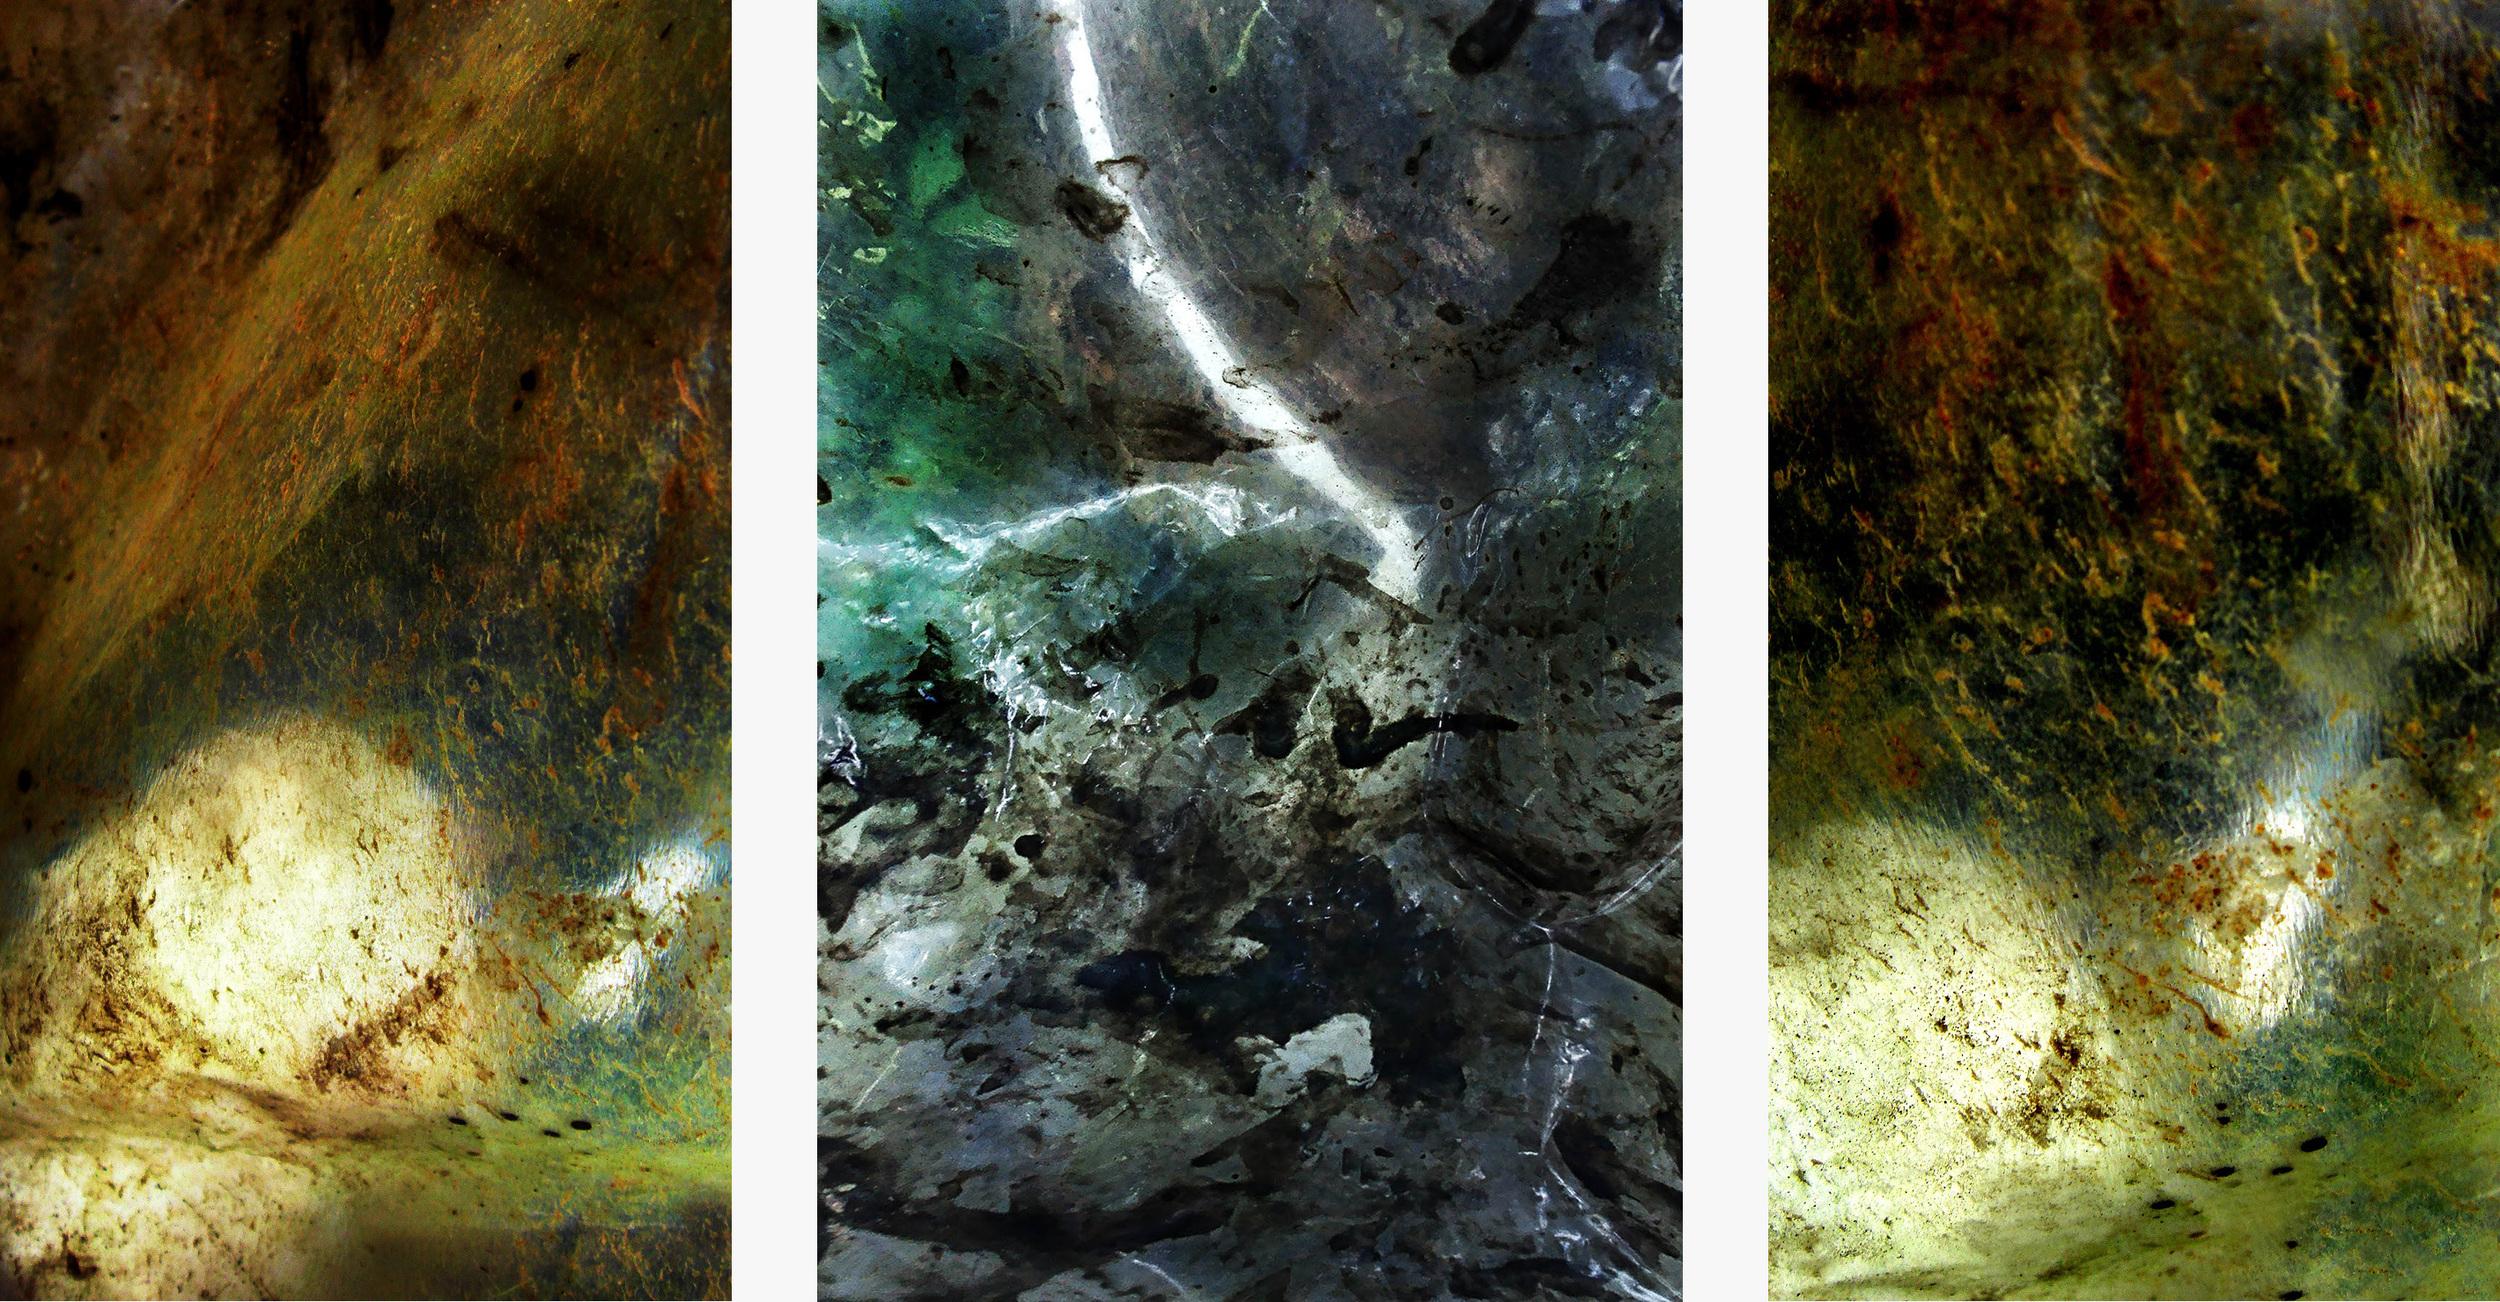 Rubato 034R/036R/0125b (2010-2013) triptyque,  100 x 198,40 cm, Pigment inks on Fine Art paper, 5 editions, artist's collection